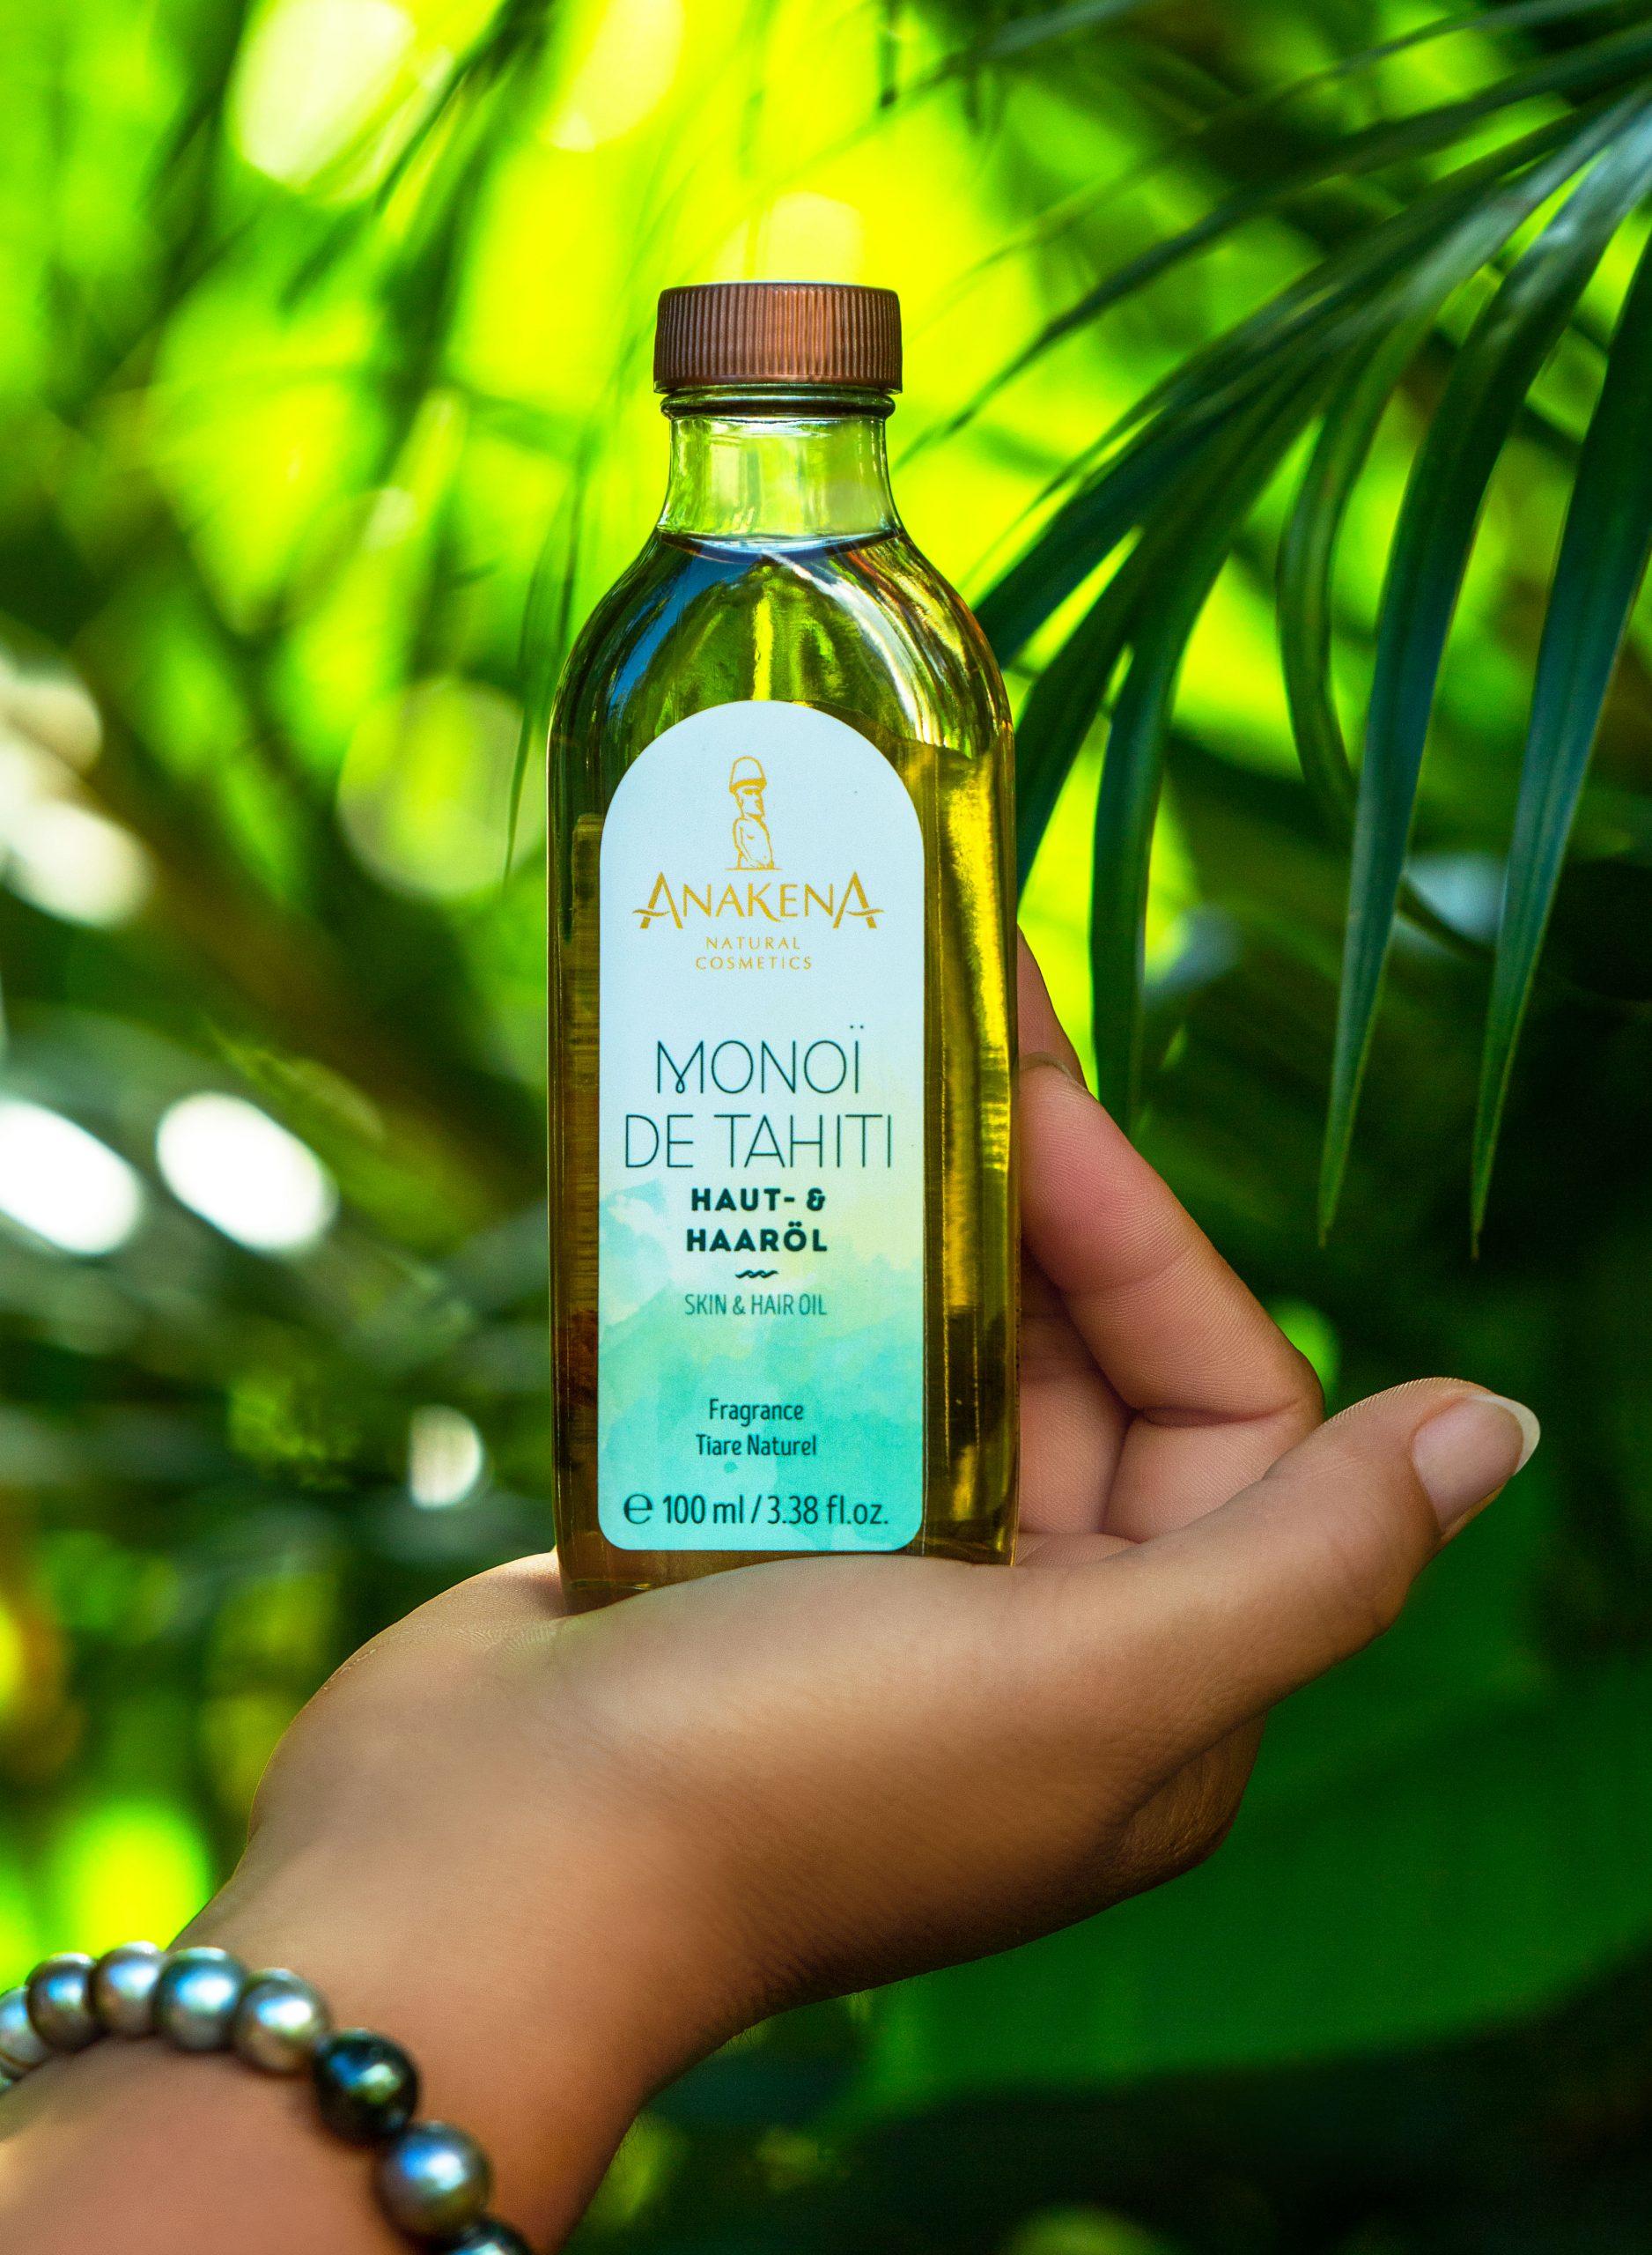 Monoi in Tahiti